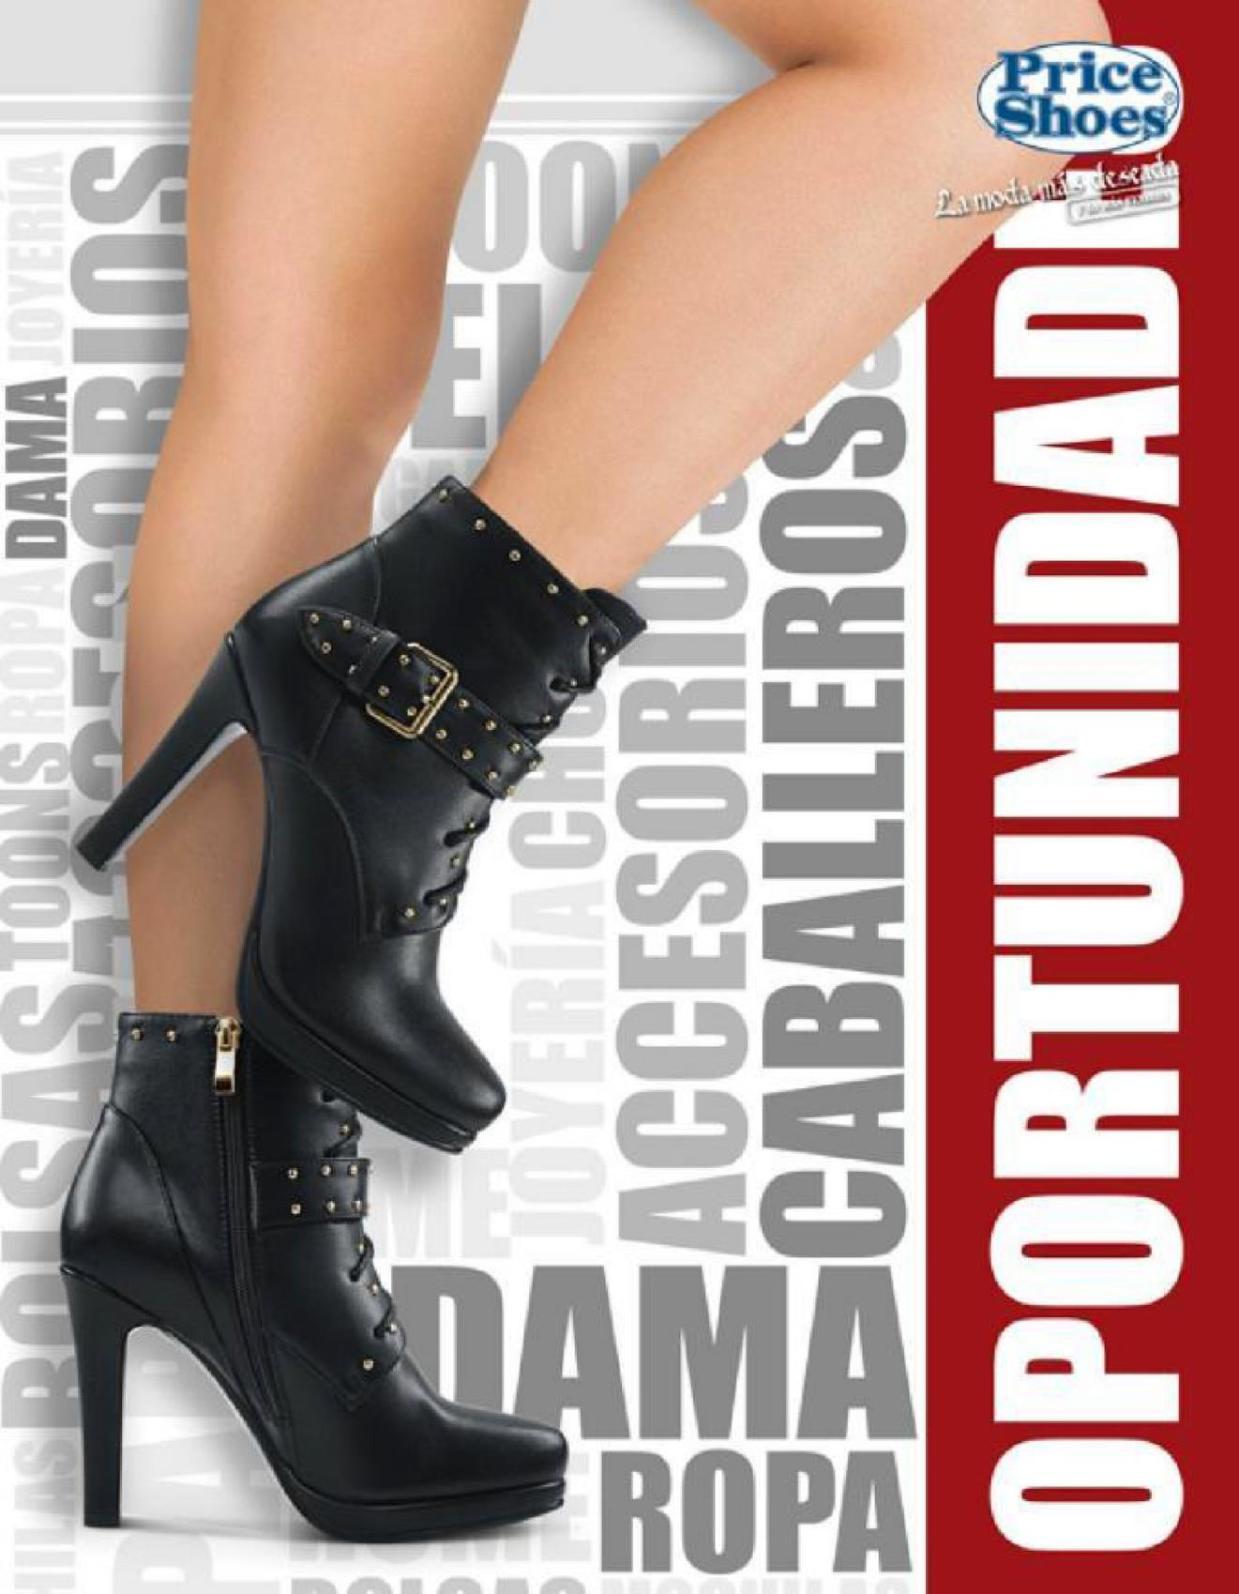 Price Shoes - 2018/12/31 - Catálogo Price Shoes - Oportunidades